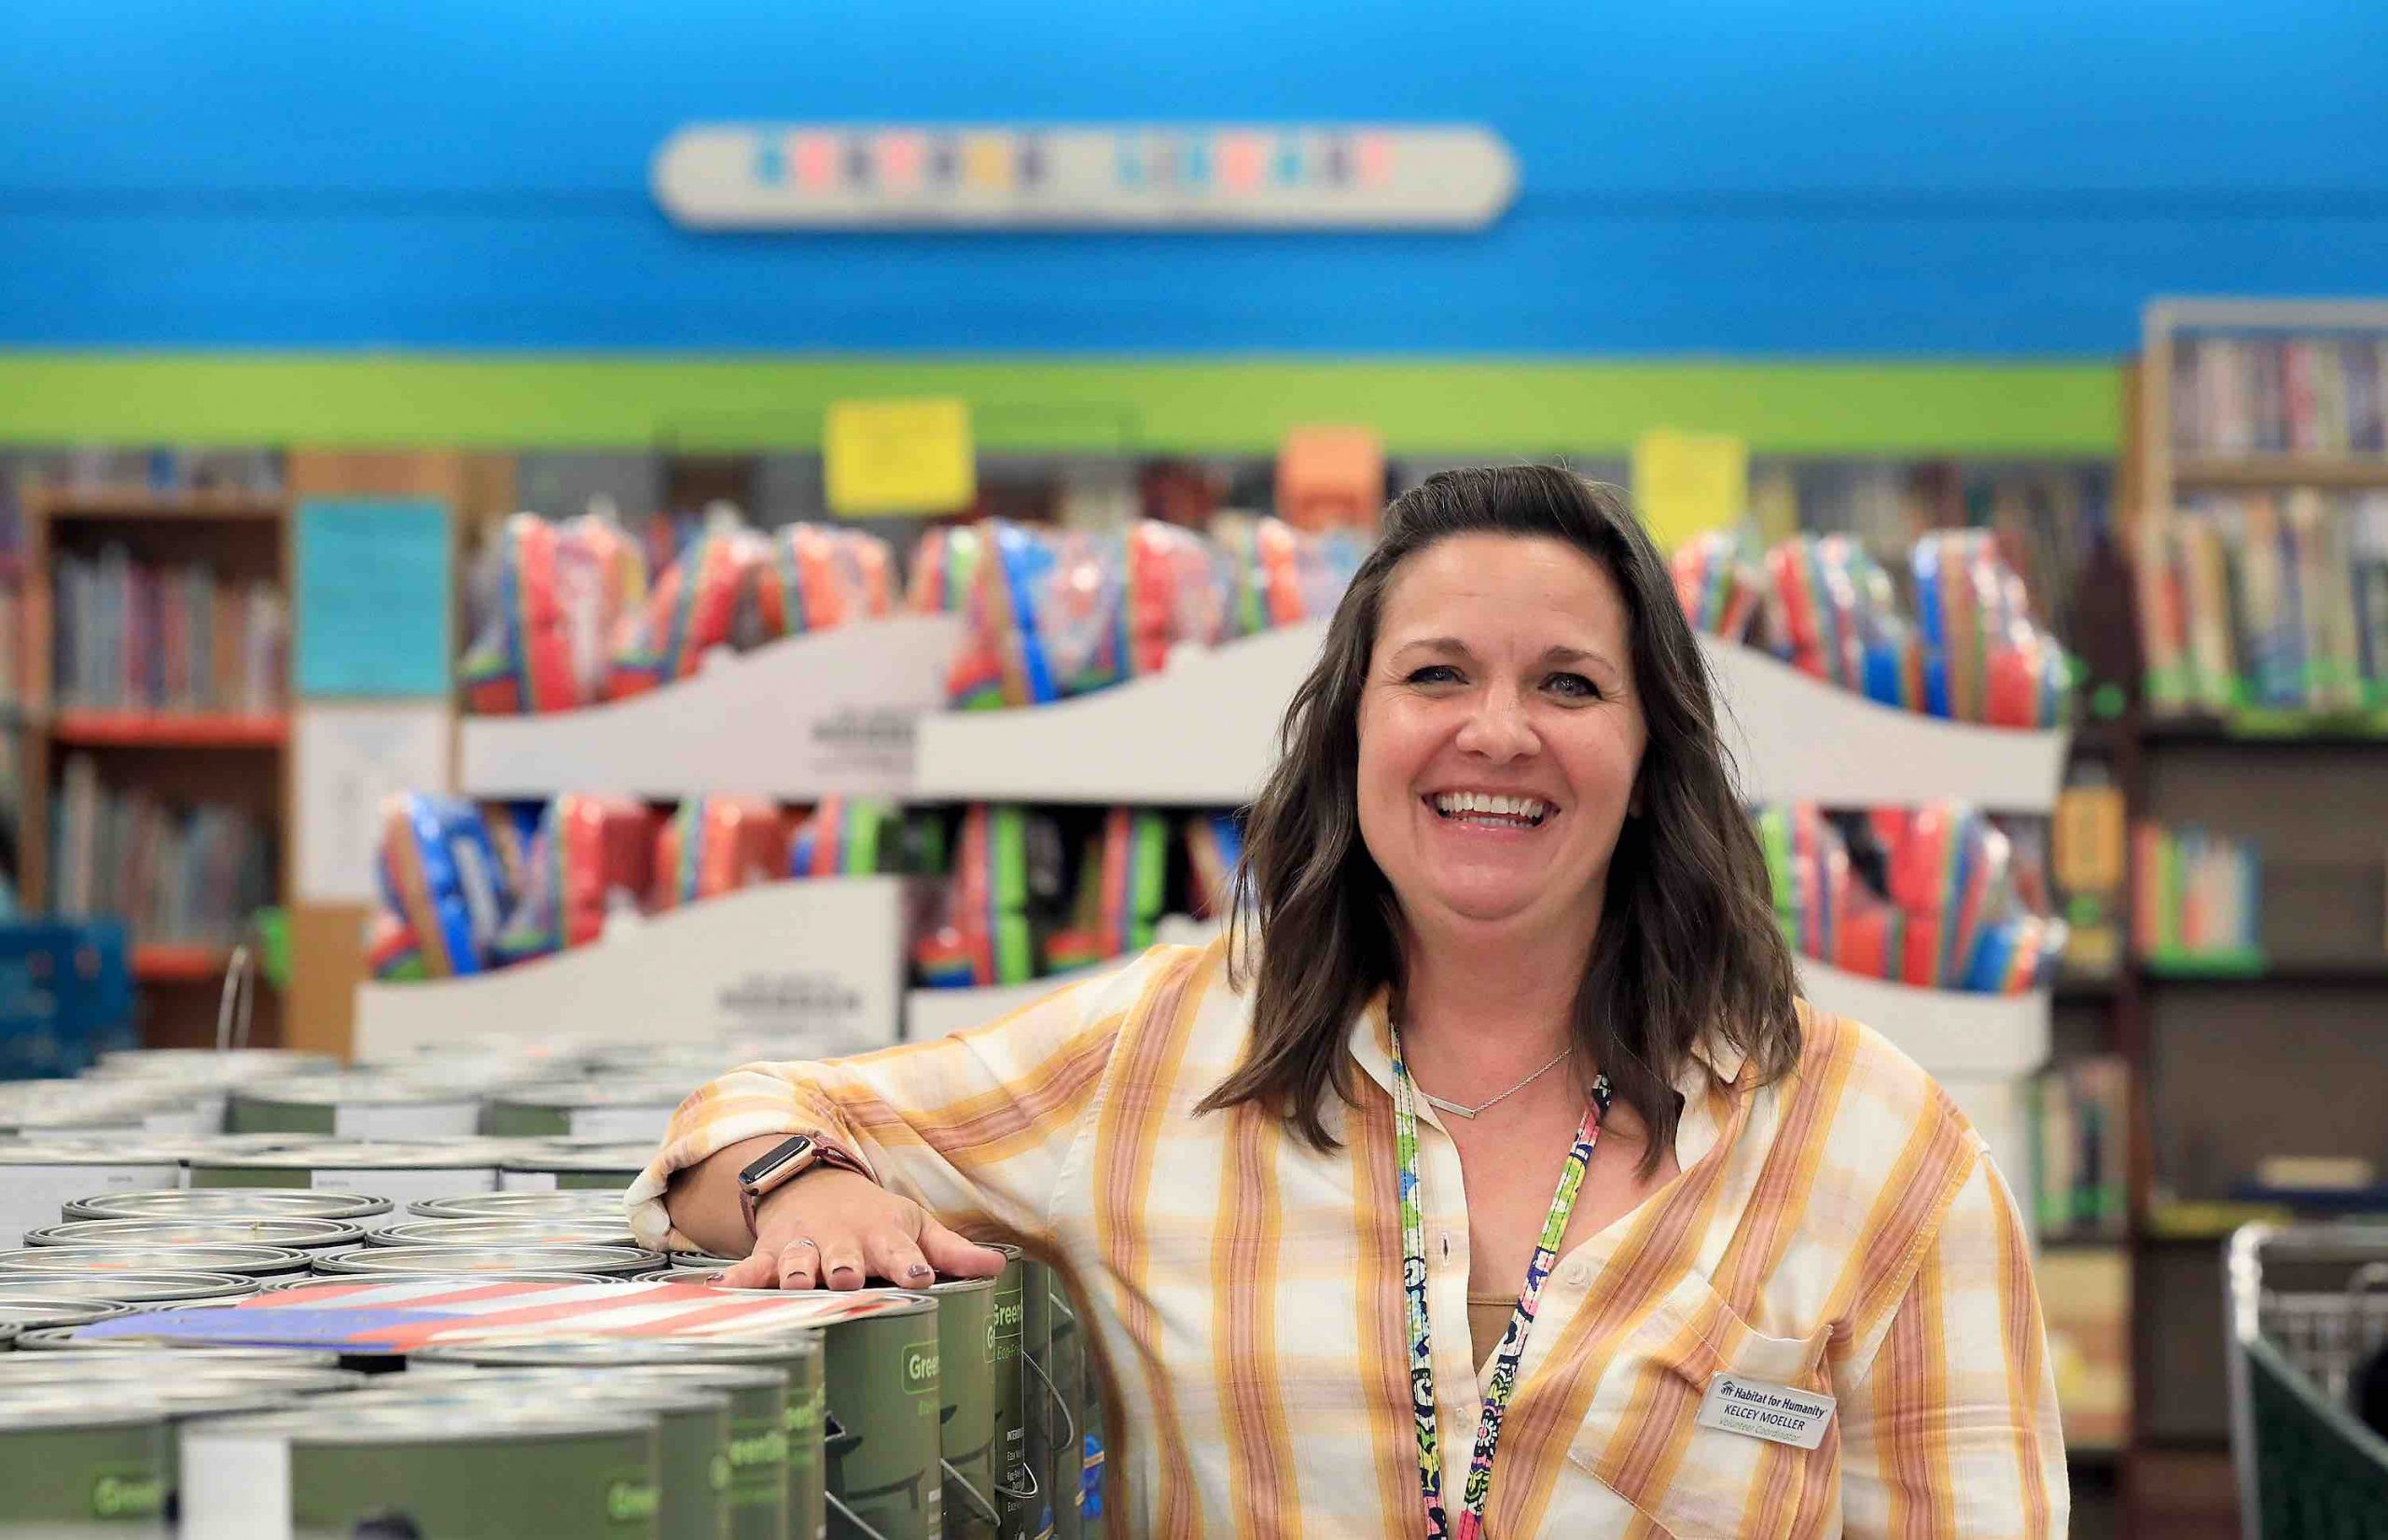 The new volunteer coordinator at the Williamsburg ReStore Kelcey Moeller Thursday August 5, 2021.